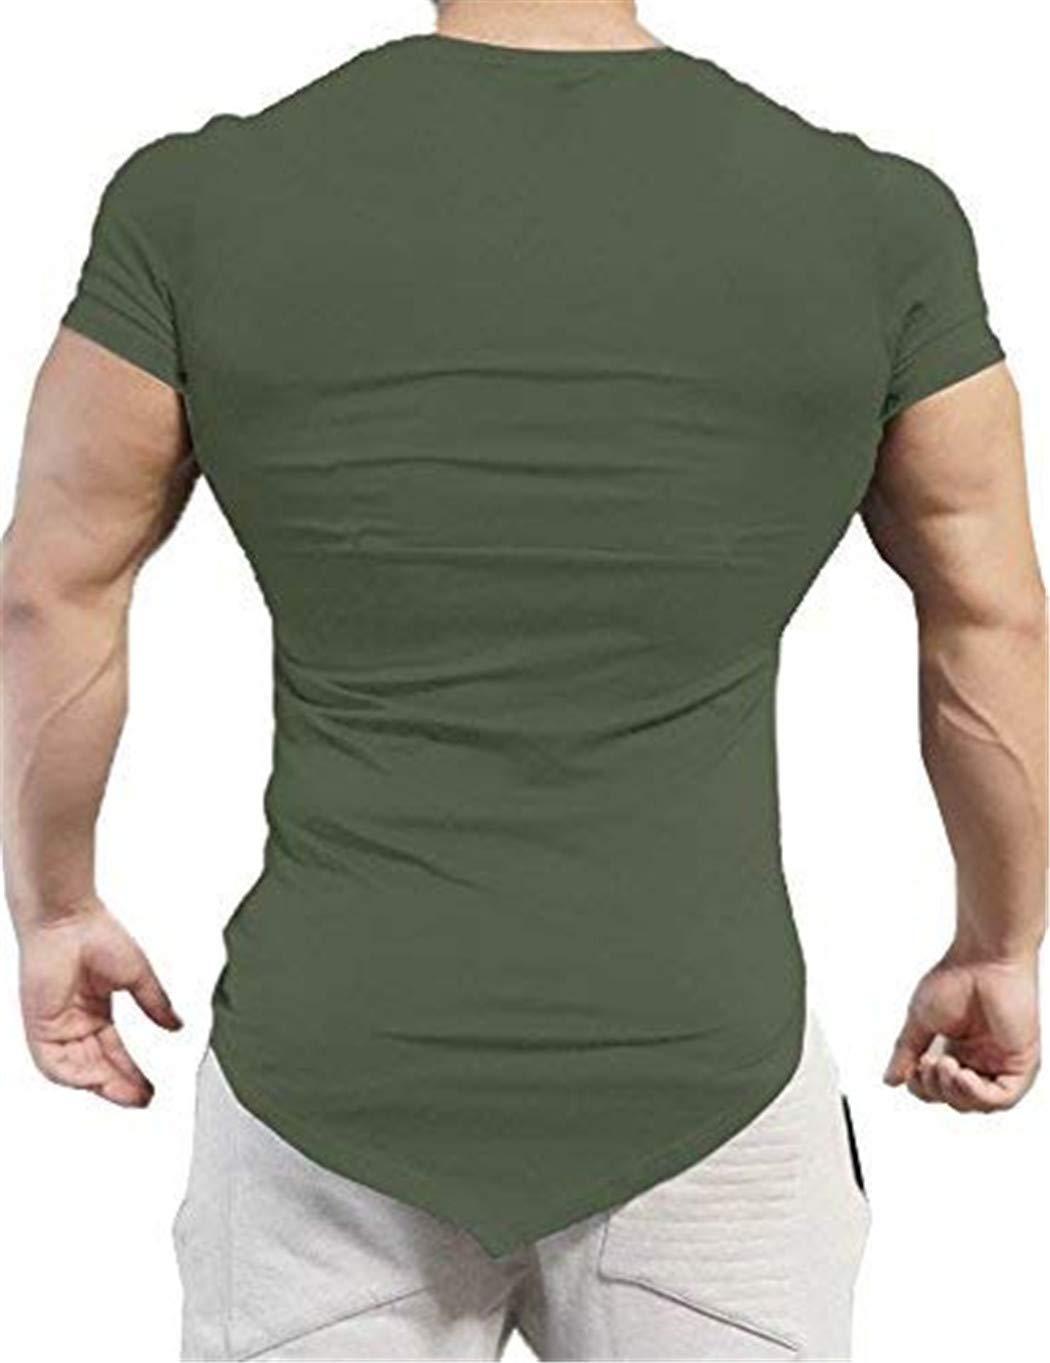 Sport T Shirts for Men Running Tops Training Tee Short Sleeve Sportswear Bodybuilding Muscle